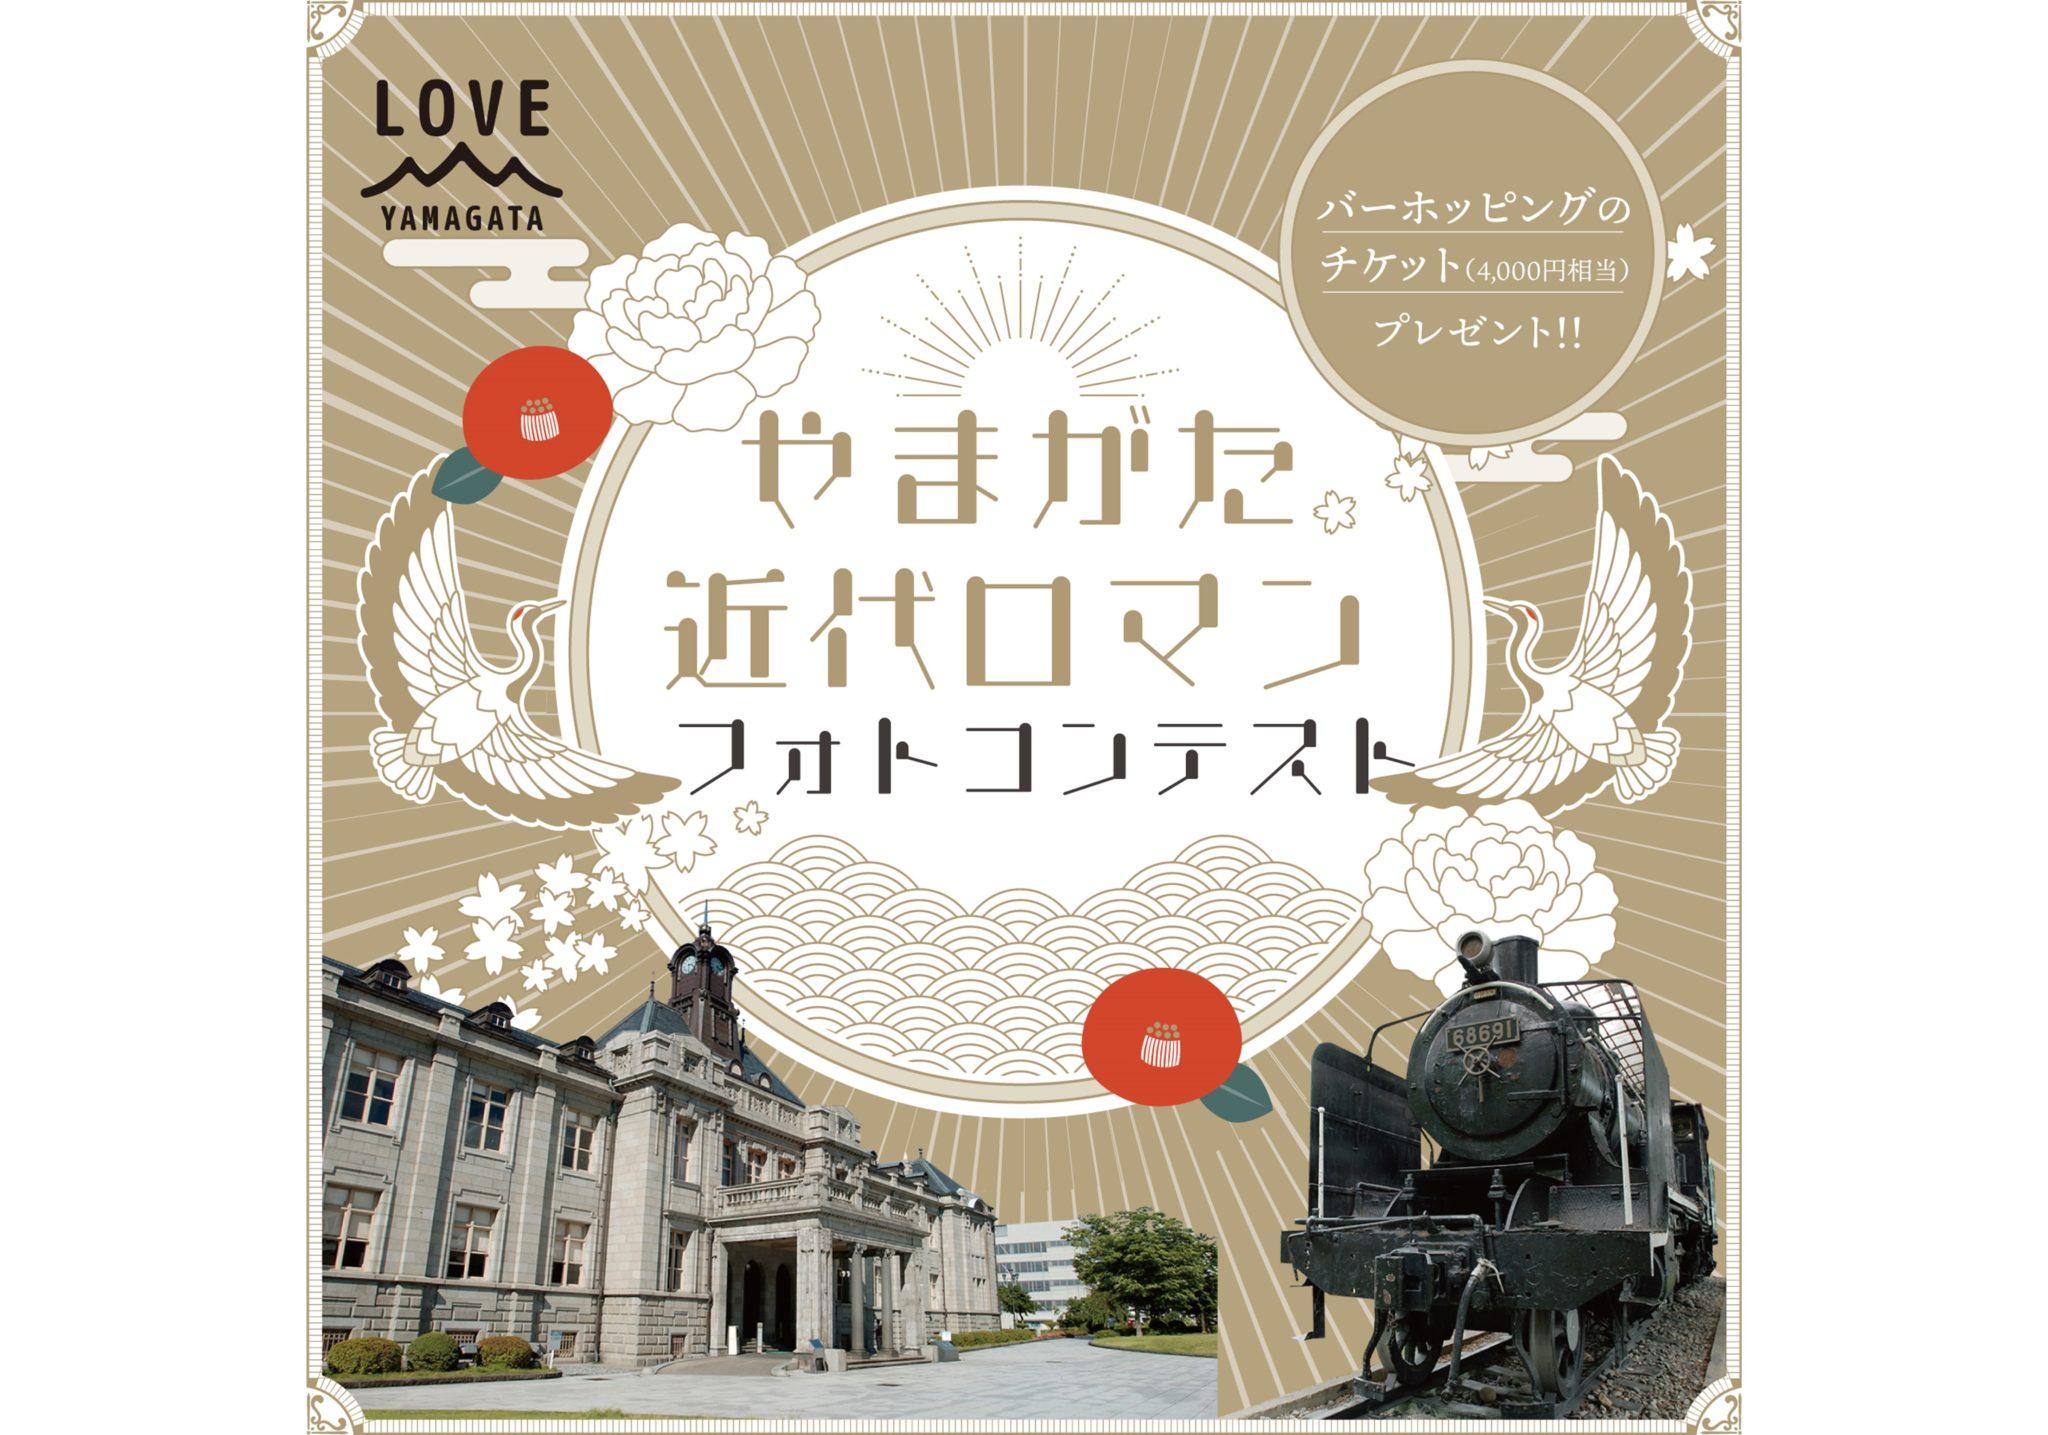 【LOVE YAMAGATA】やまがた近代ロマン フォトコンテスト キャンペーン